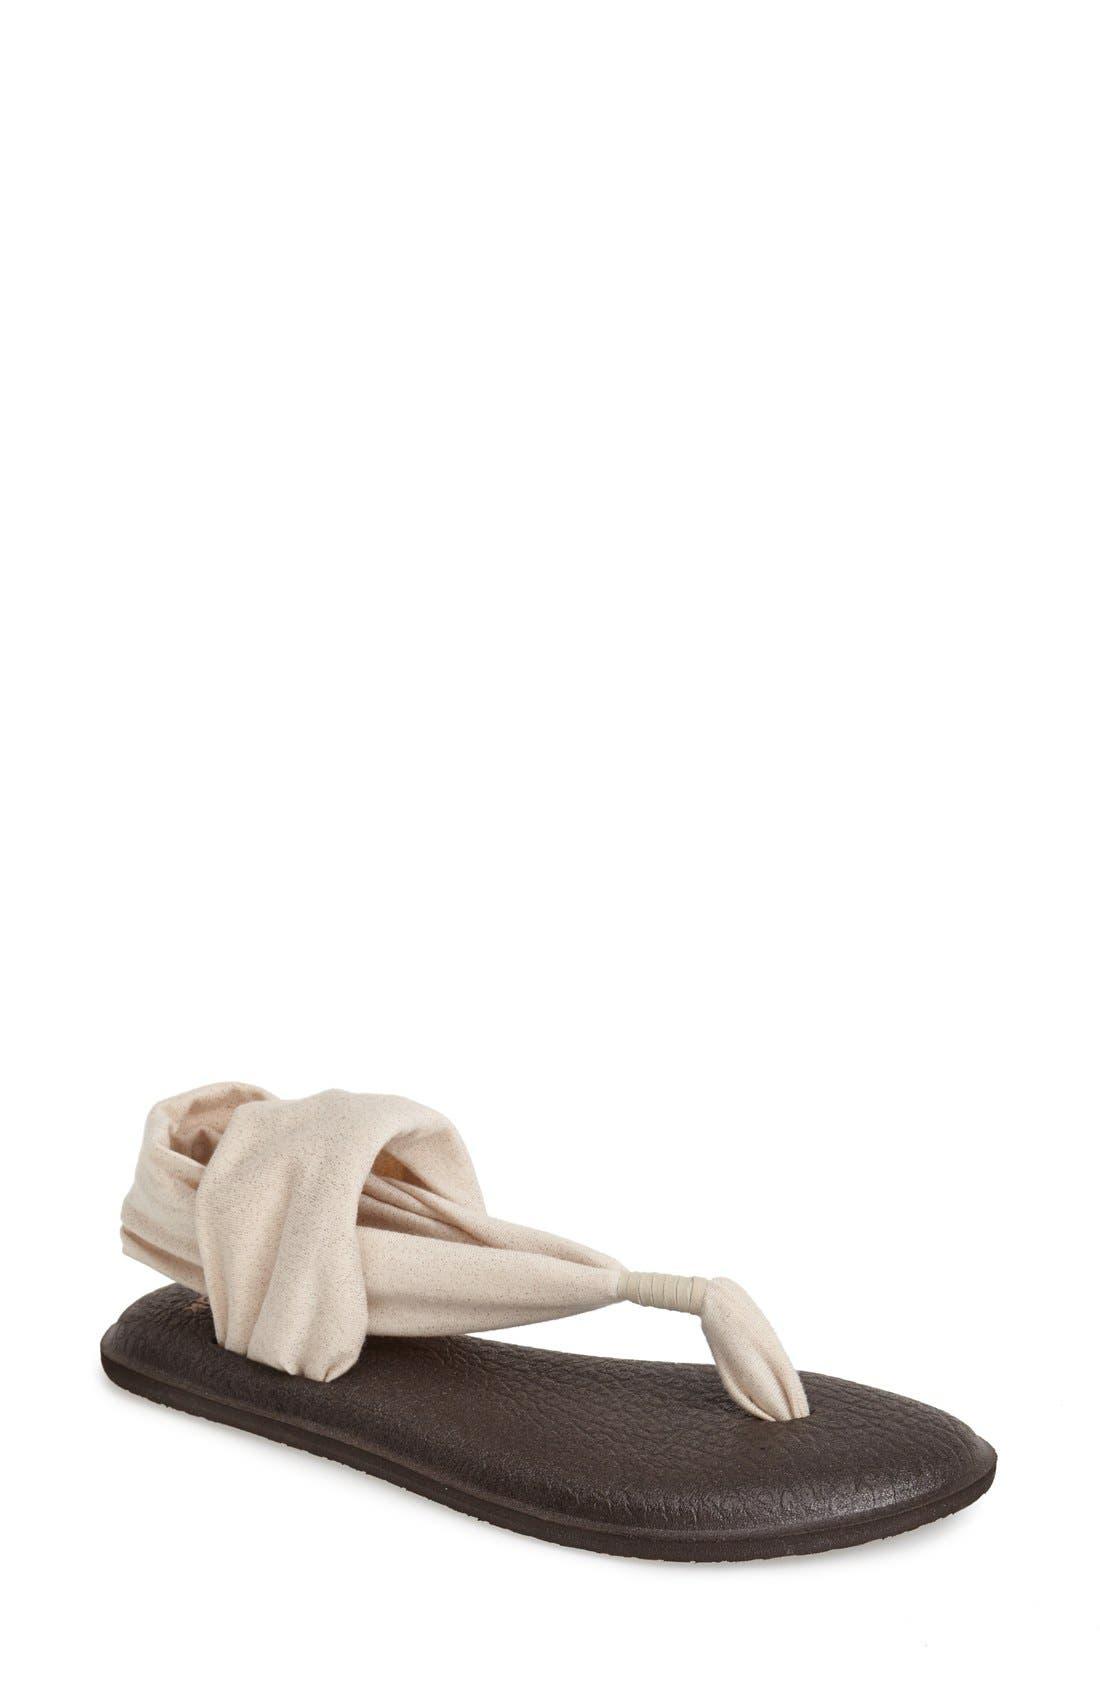 'Yoga Metallic Sling' Sandal,                             Main thumbnail 1, color,                             650